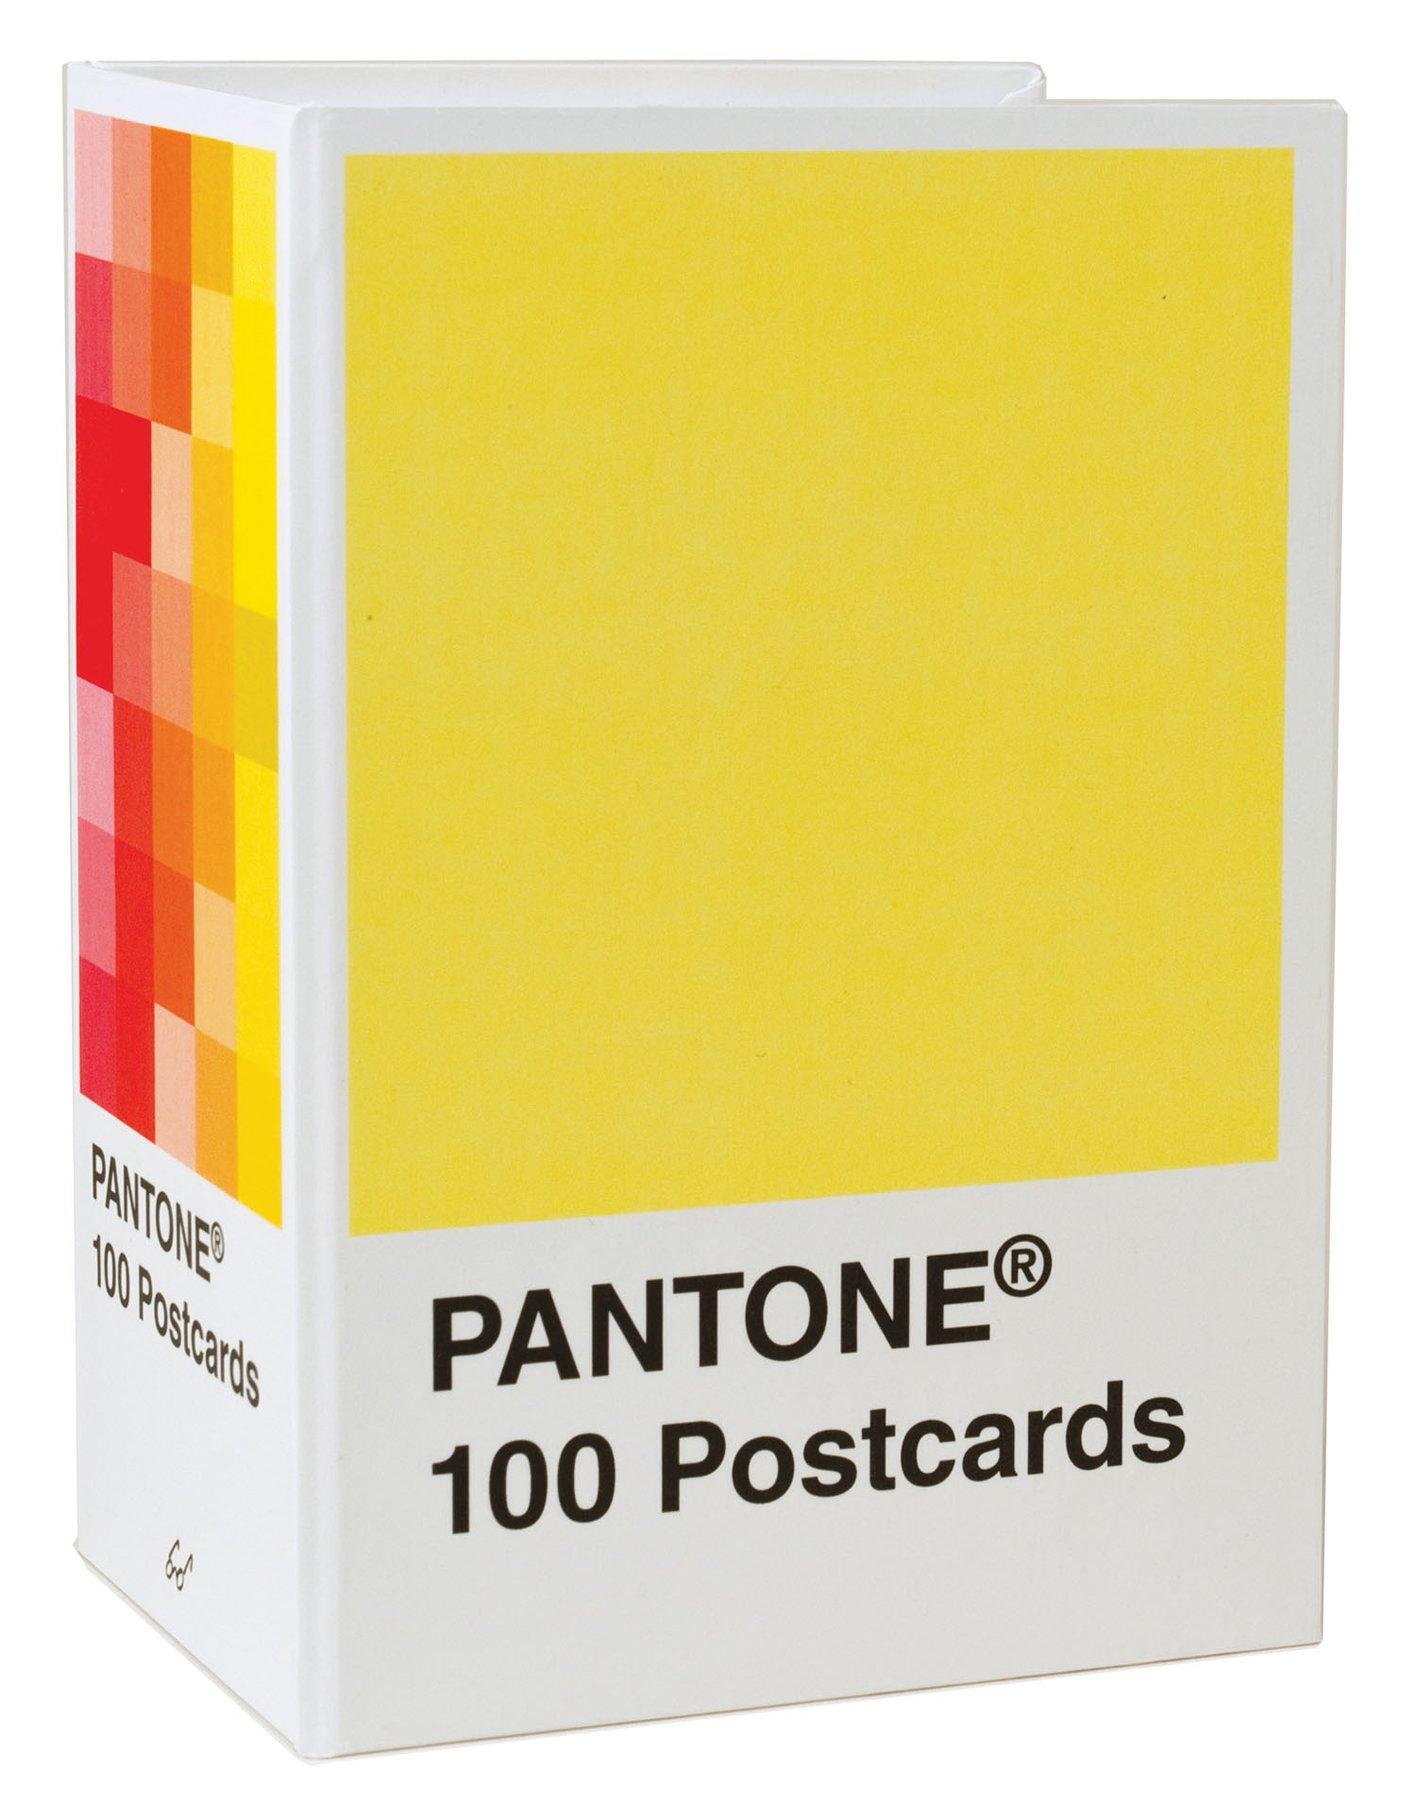 Pantone Postcard Box: 100 Postcards by Chronicle Books